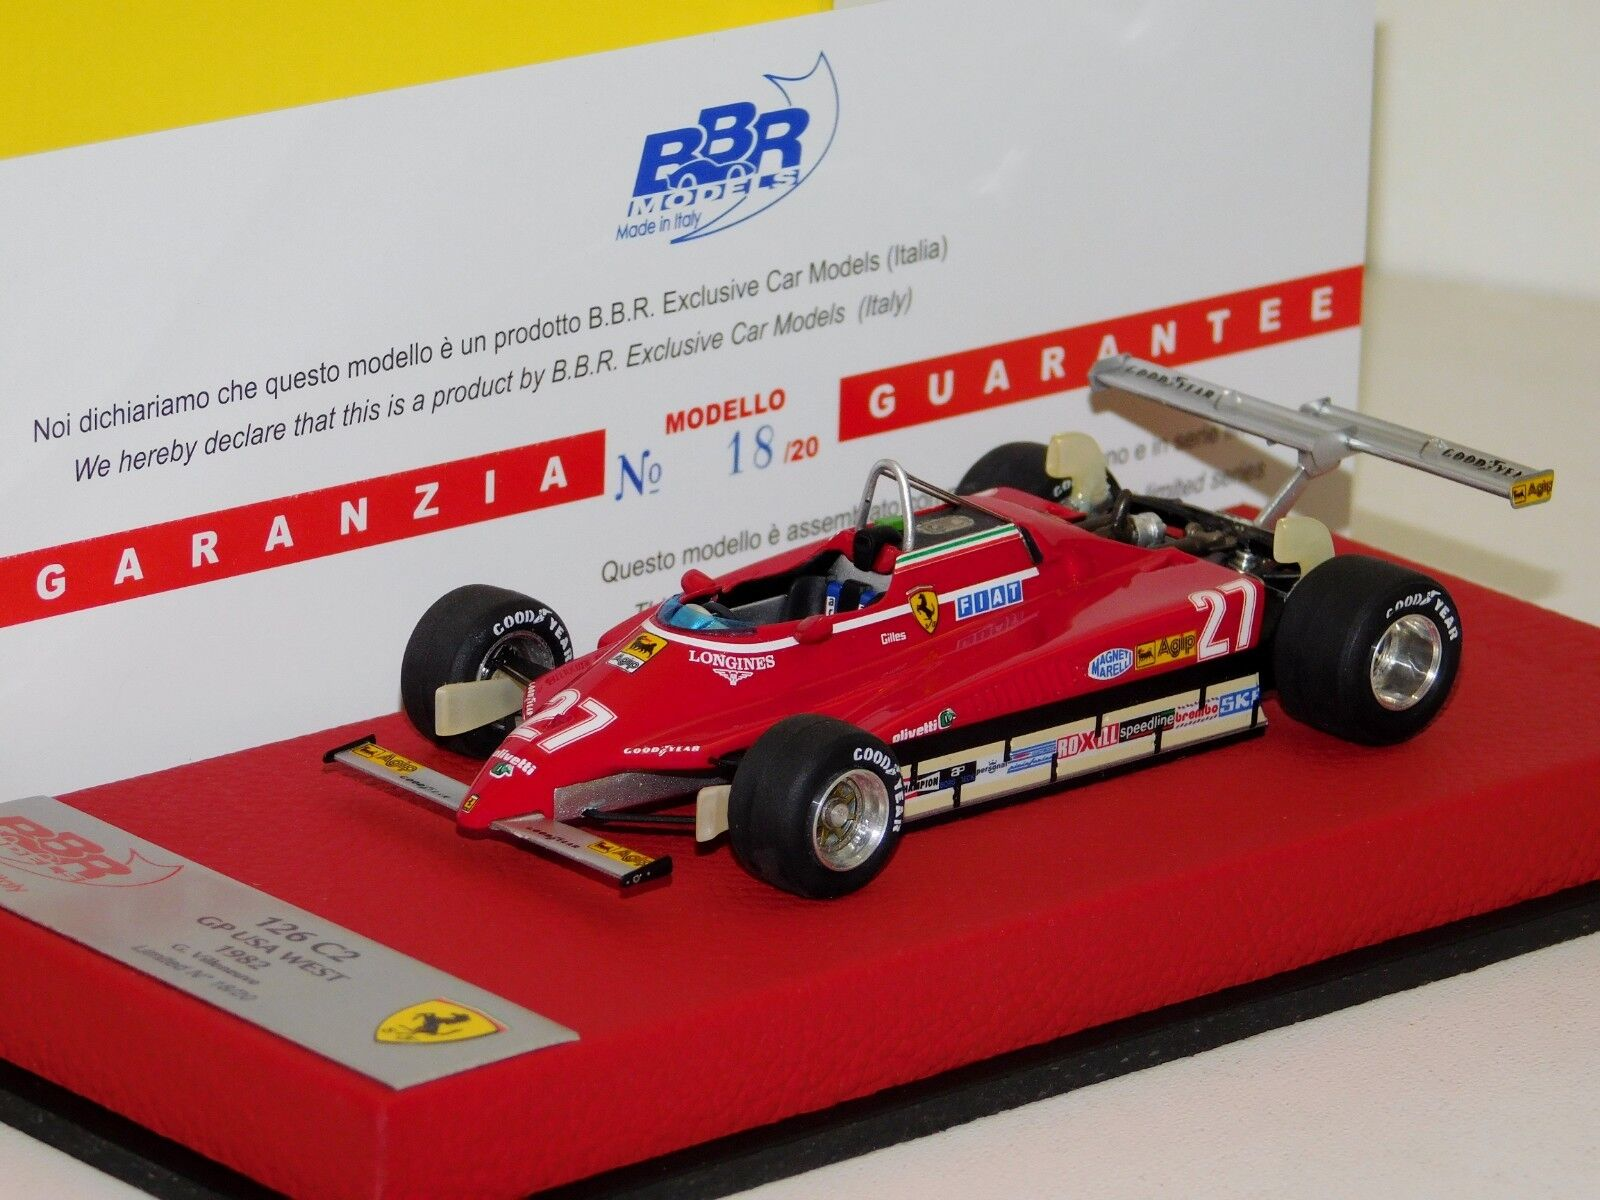 FERRARI 126 C2 US GP 1982  27 G. VILLENUEVE BBR BG321PRE LIM. 20 PCS 1 43